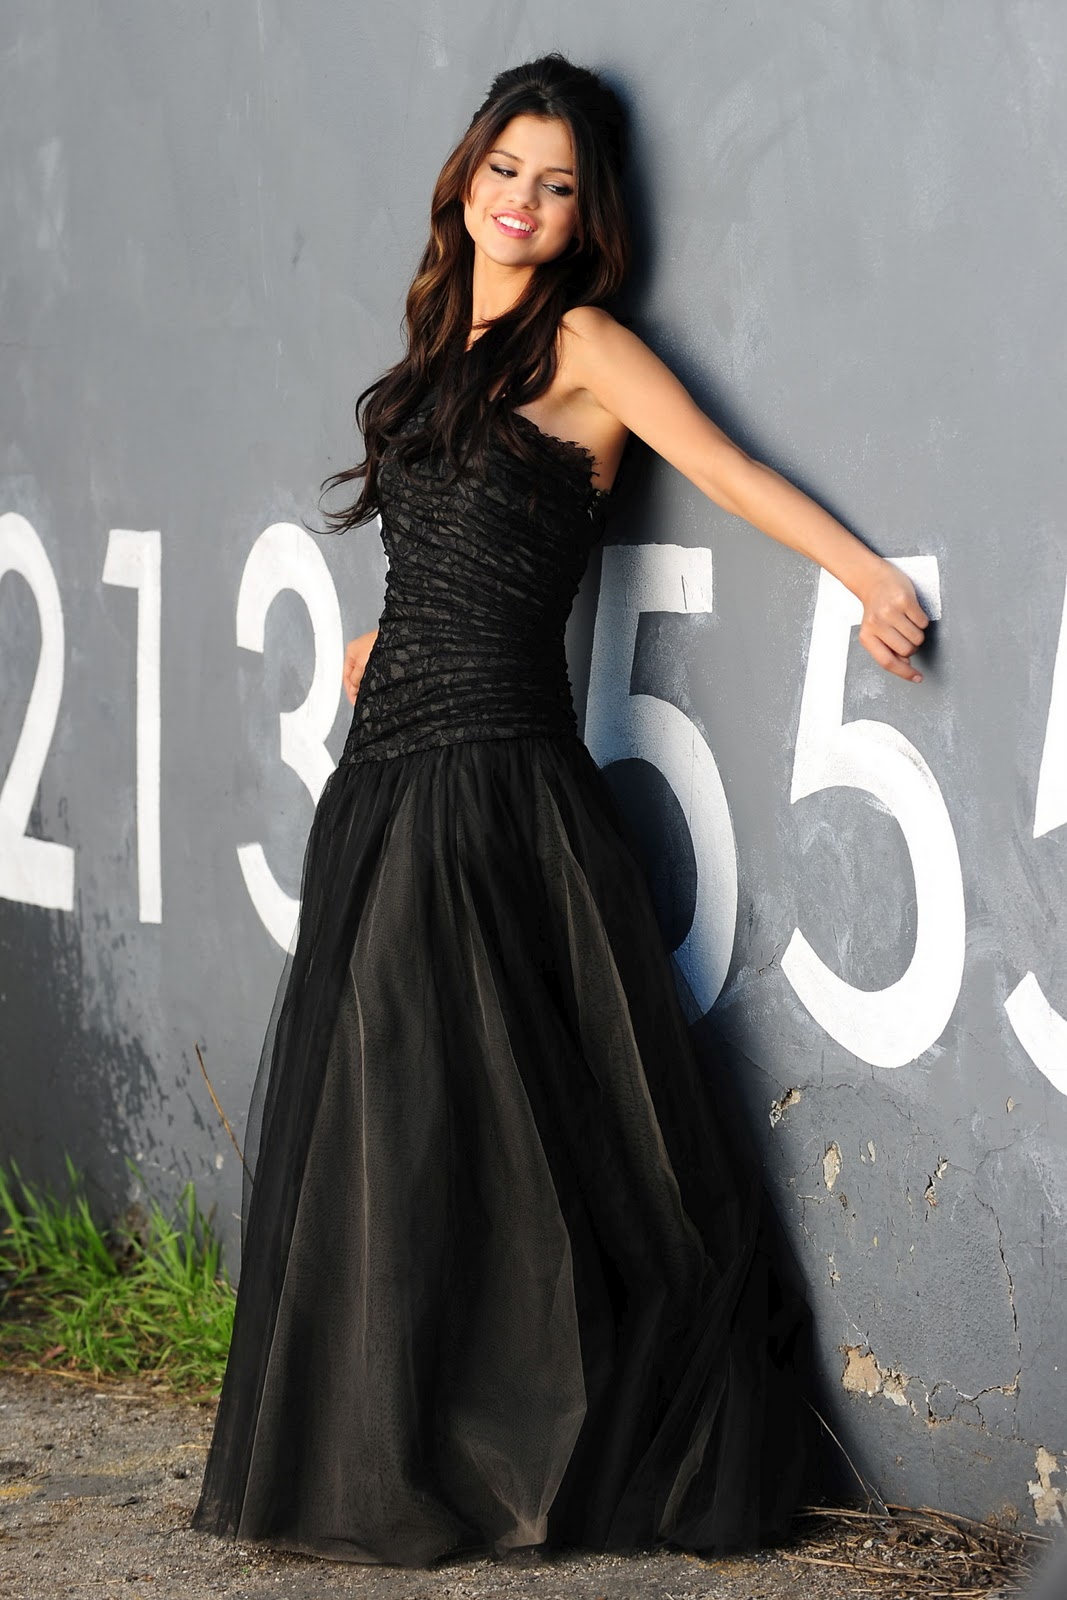 http://3.bp.blogspot.com/-datuE9ncTgw/TWPWQQ70JOI/AAAAAAAAPZ4/dCLJZE3VE_o/s1600/Selena-Gomez-101.jpg